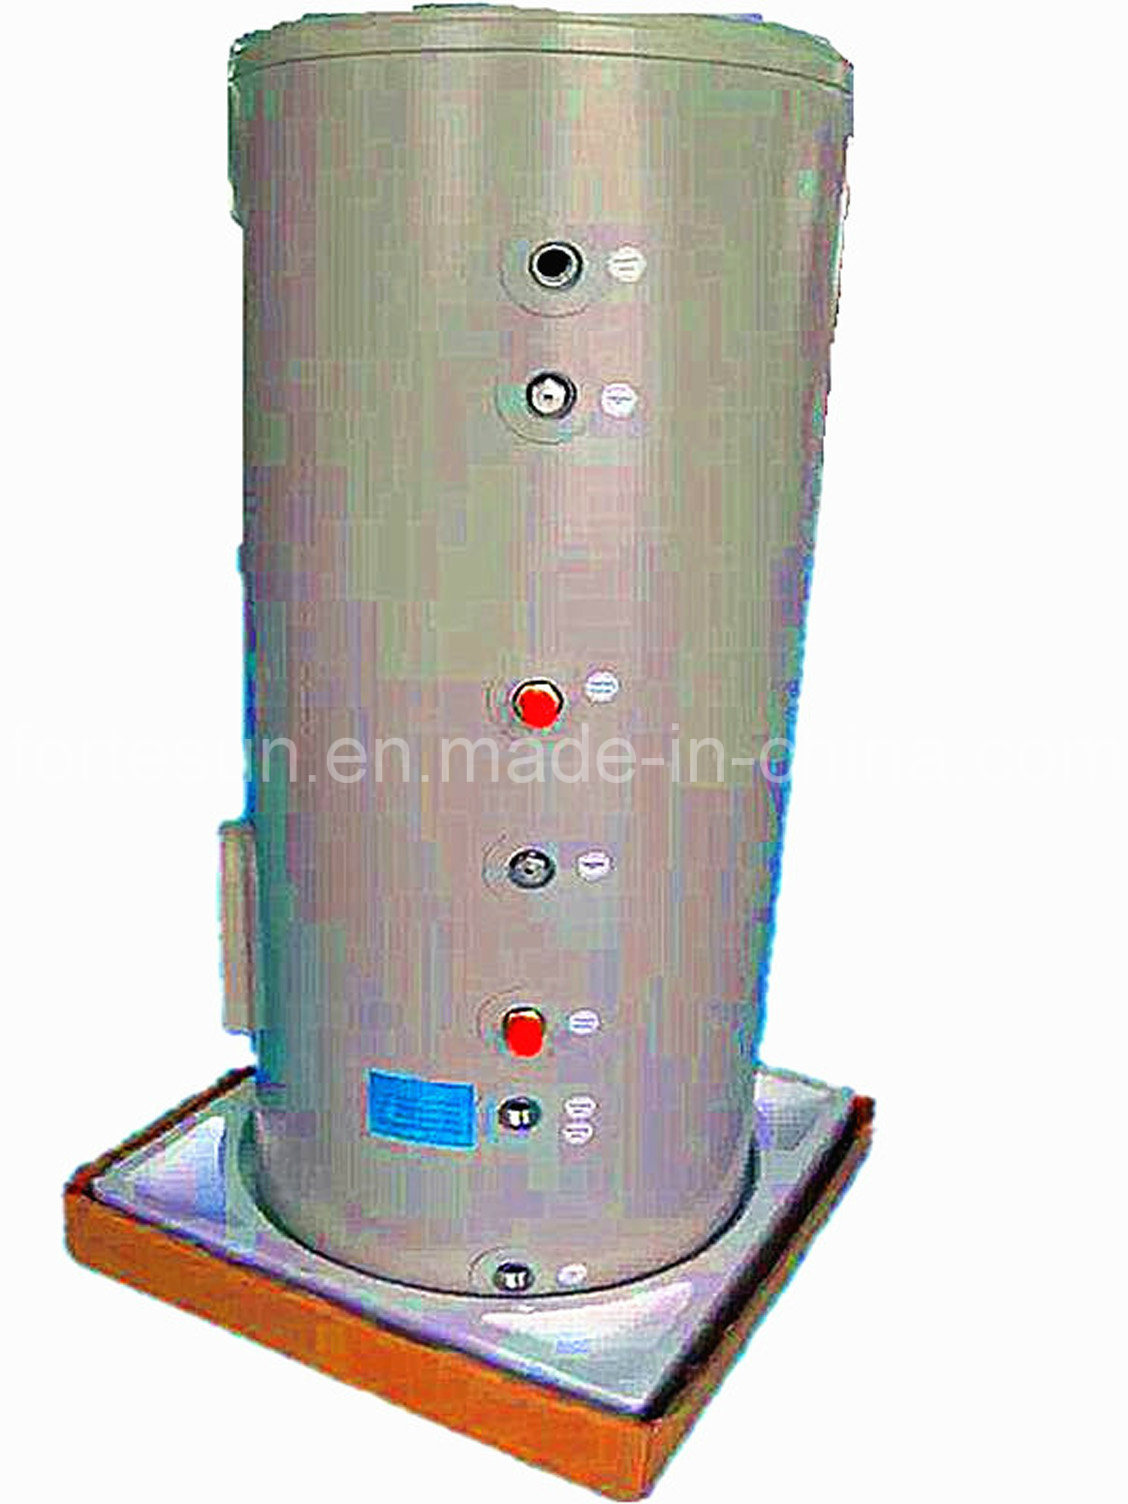 China 200L High Pressure Hot Water Storage Tank - China Water Tank ...